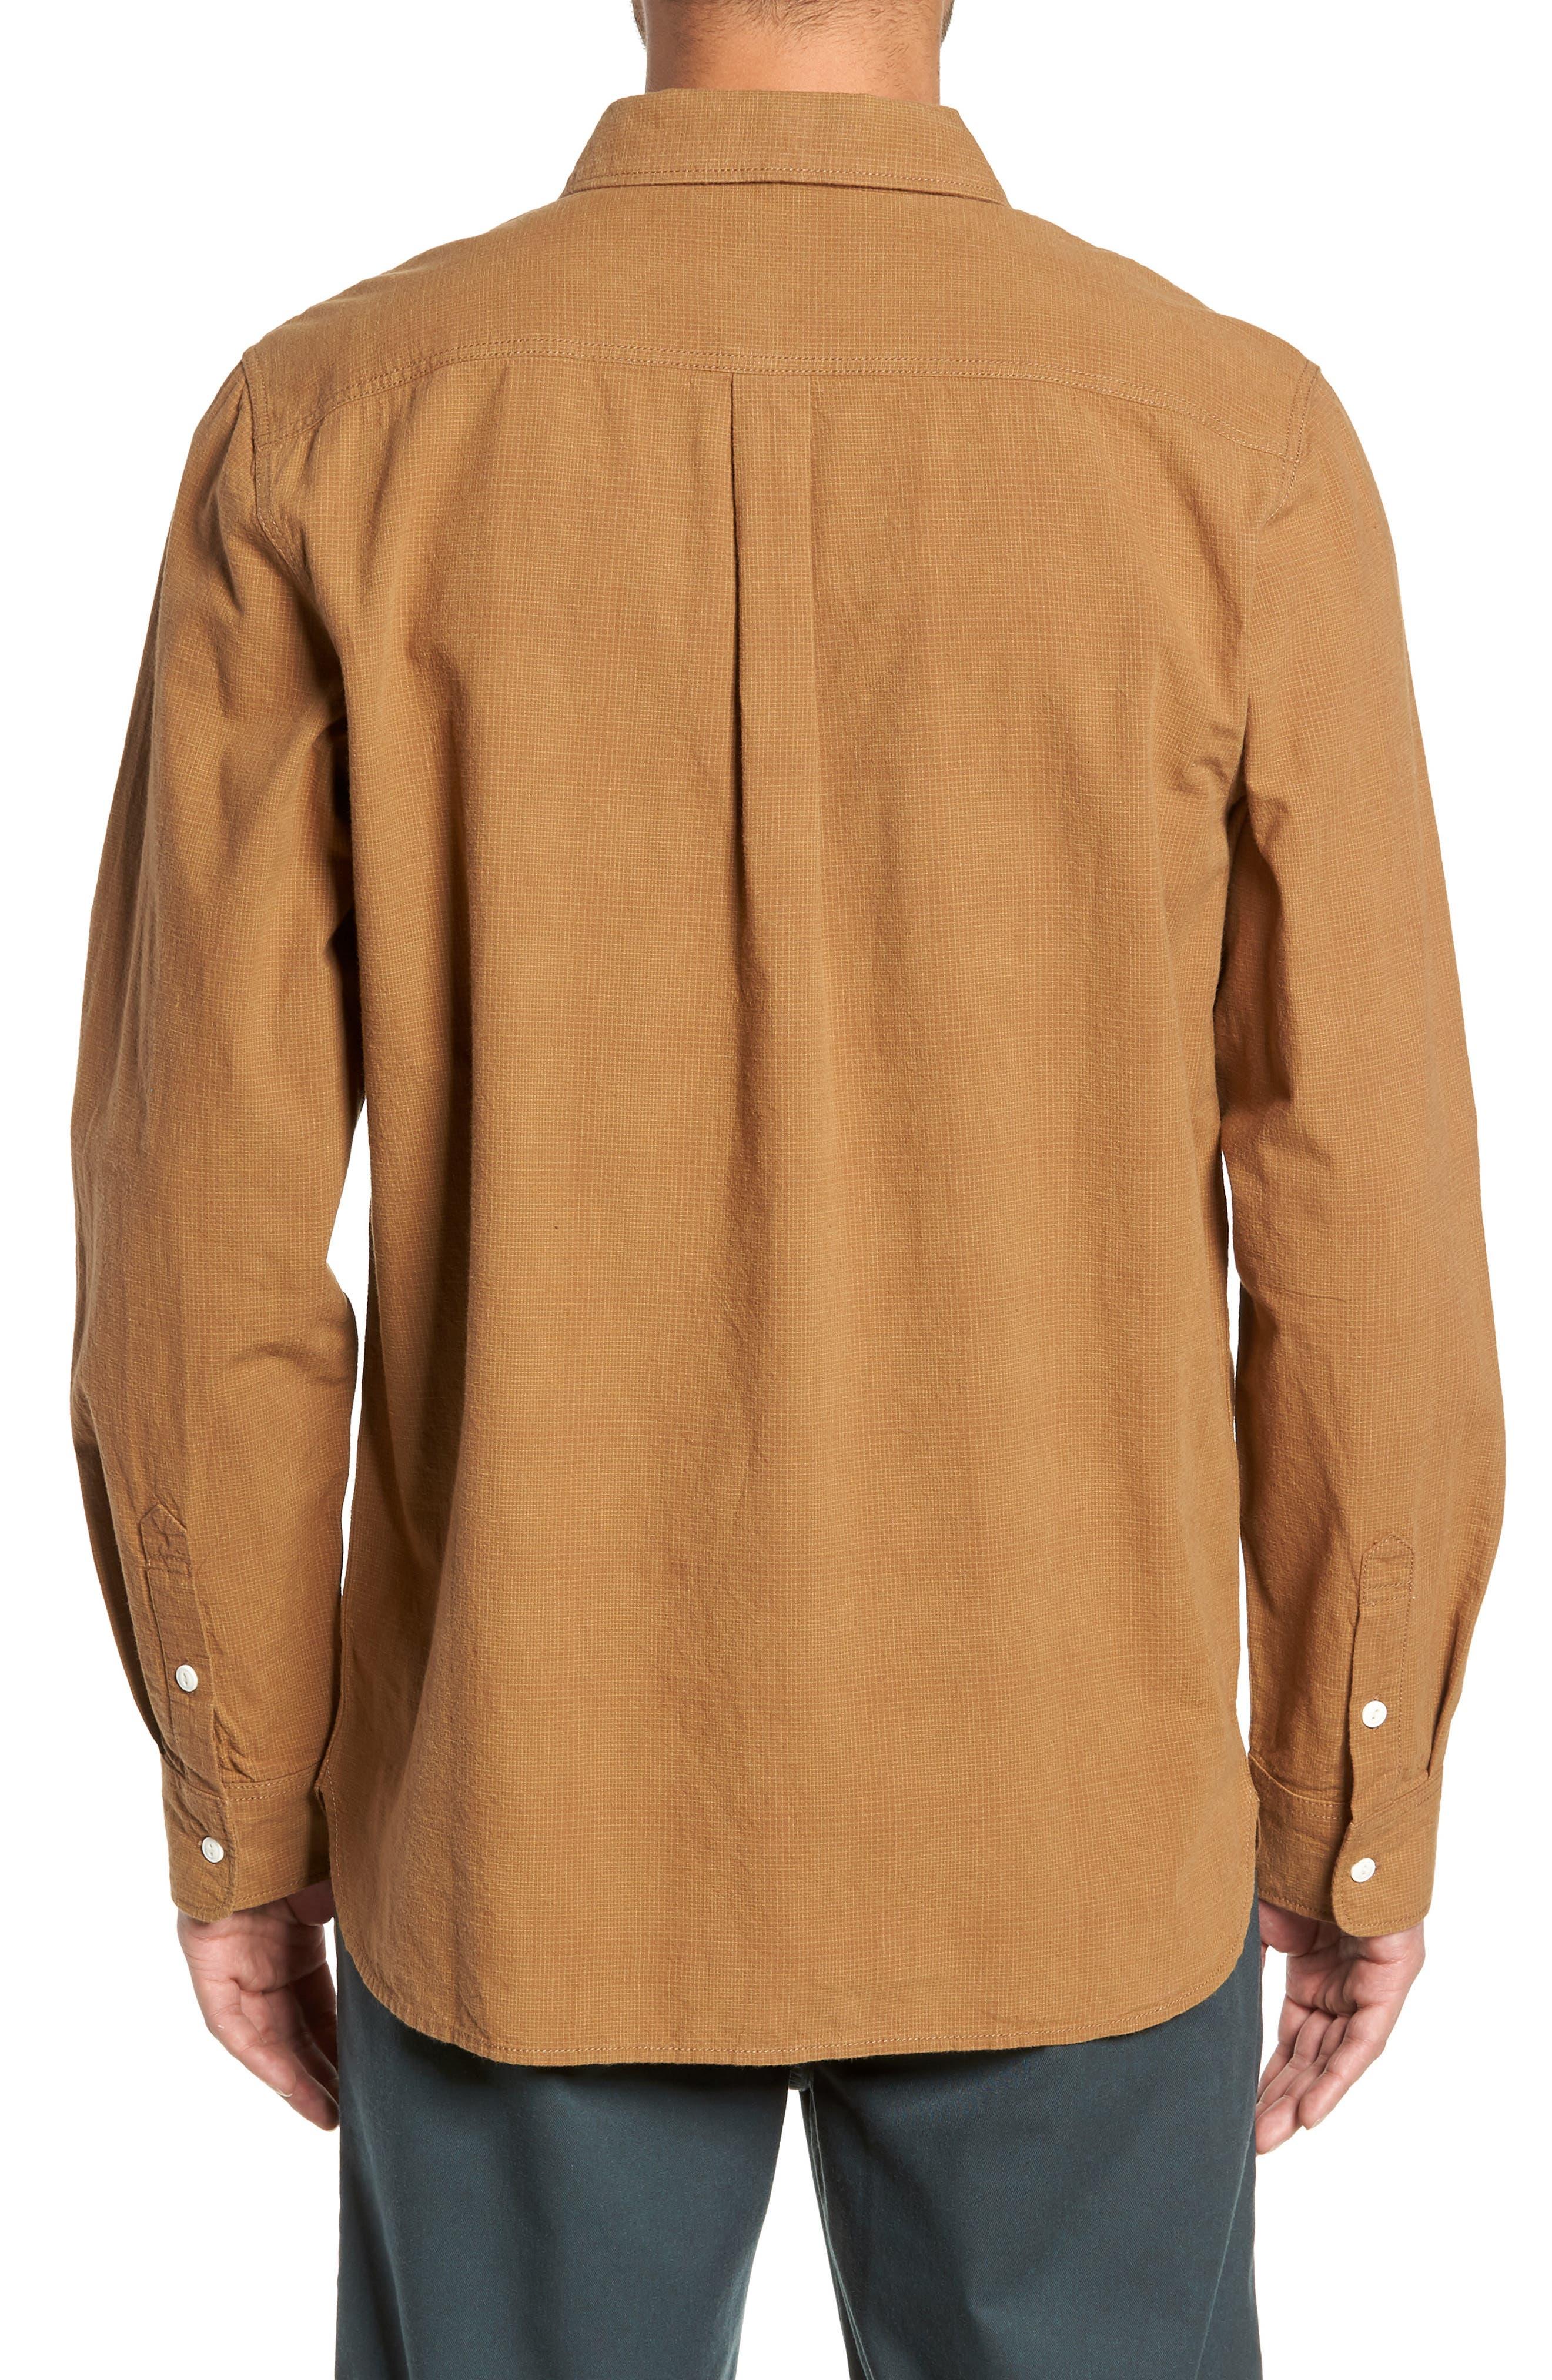 Durhamd Ombré Plaid Sport Shirt,                             Alternate thumbnail 3, color,                             DIRT